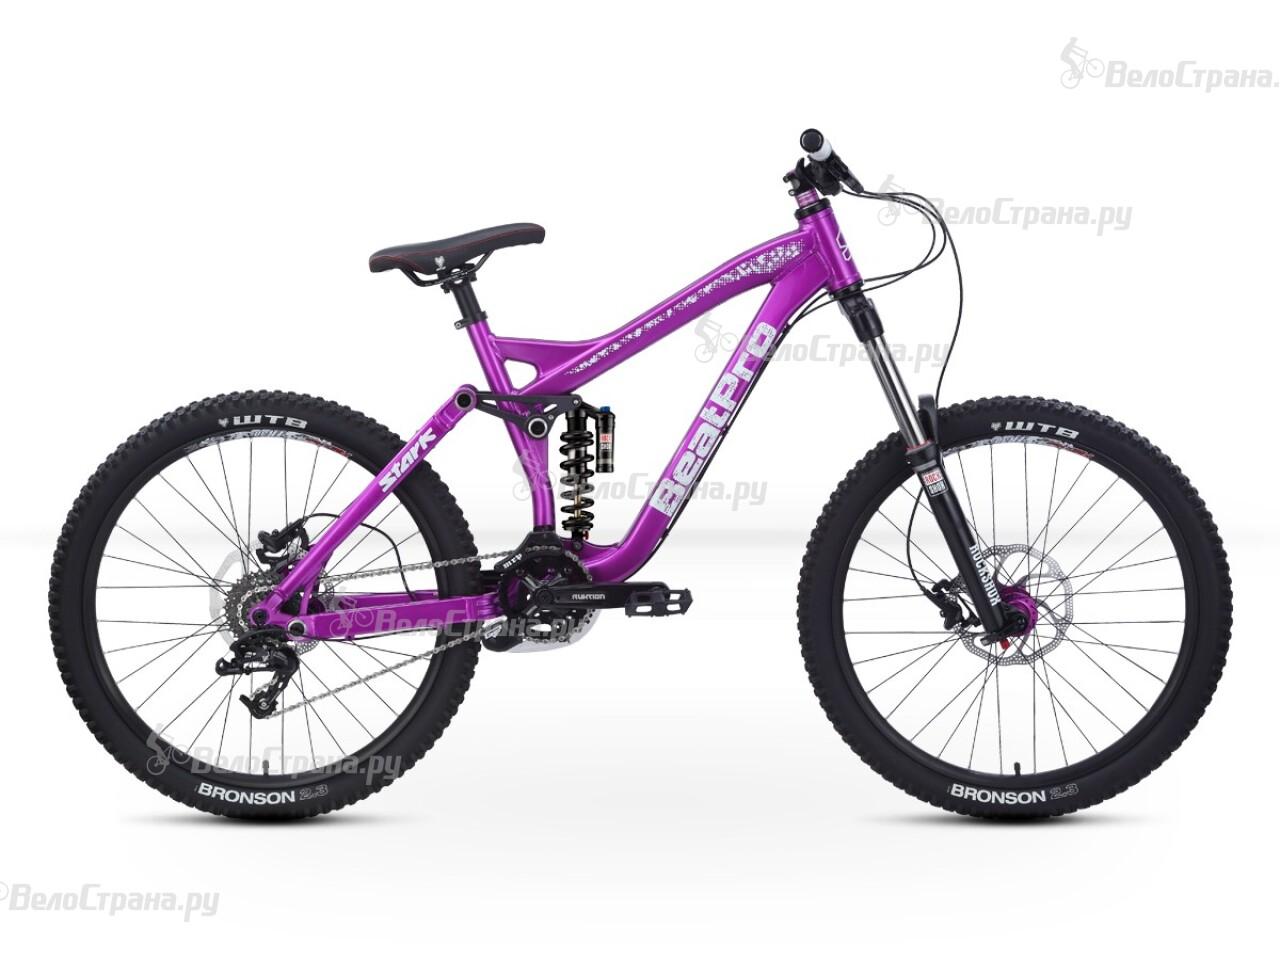 Велосипед Stark Beat Pro (2013) rockshox domain dual crown 2014